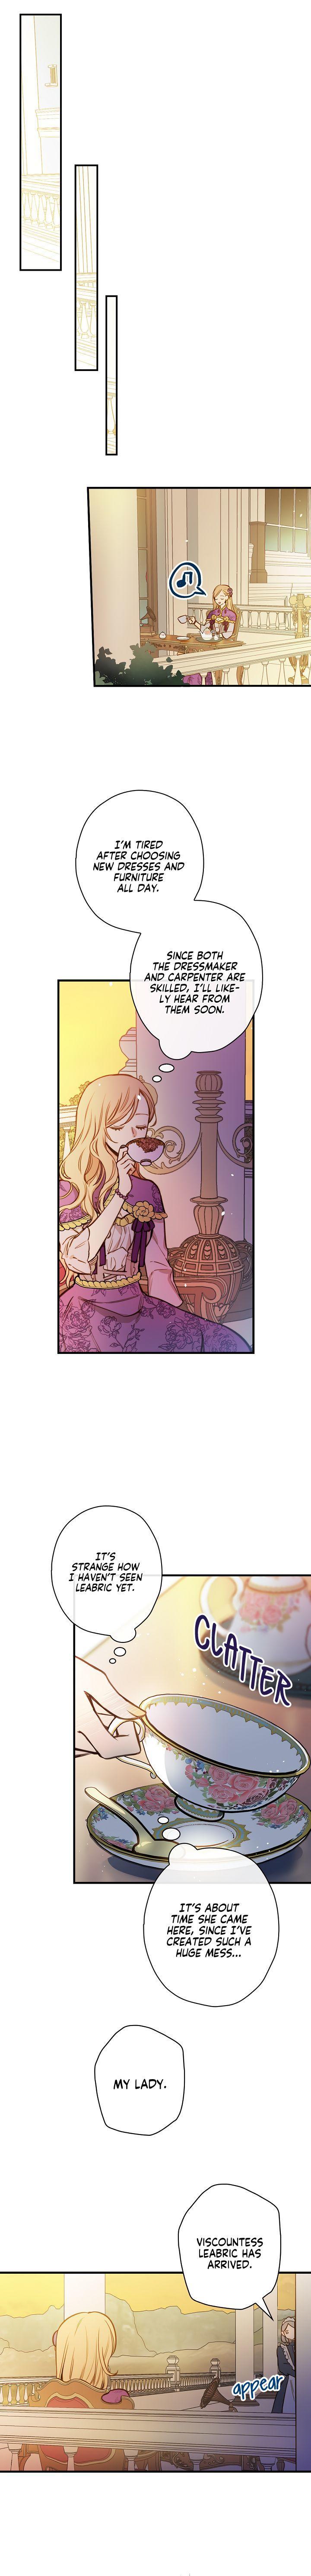 Shadow Queen Chapter 15 page 11 - Mangakakalots.com